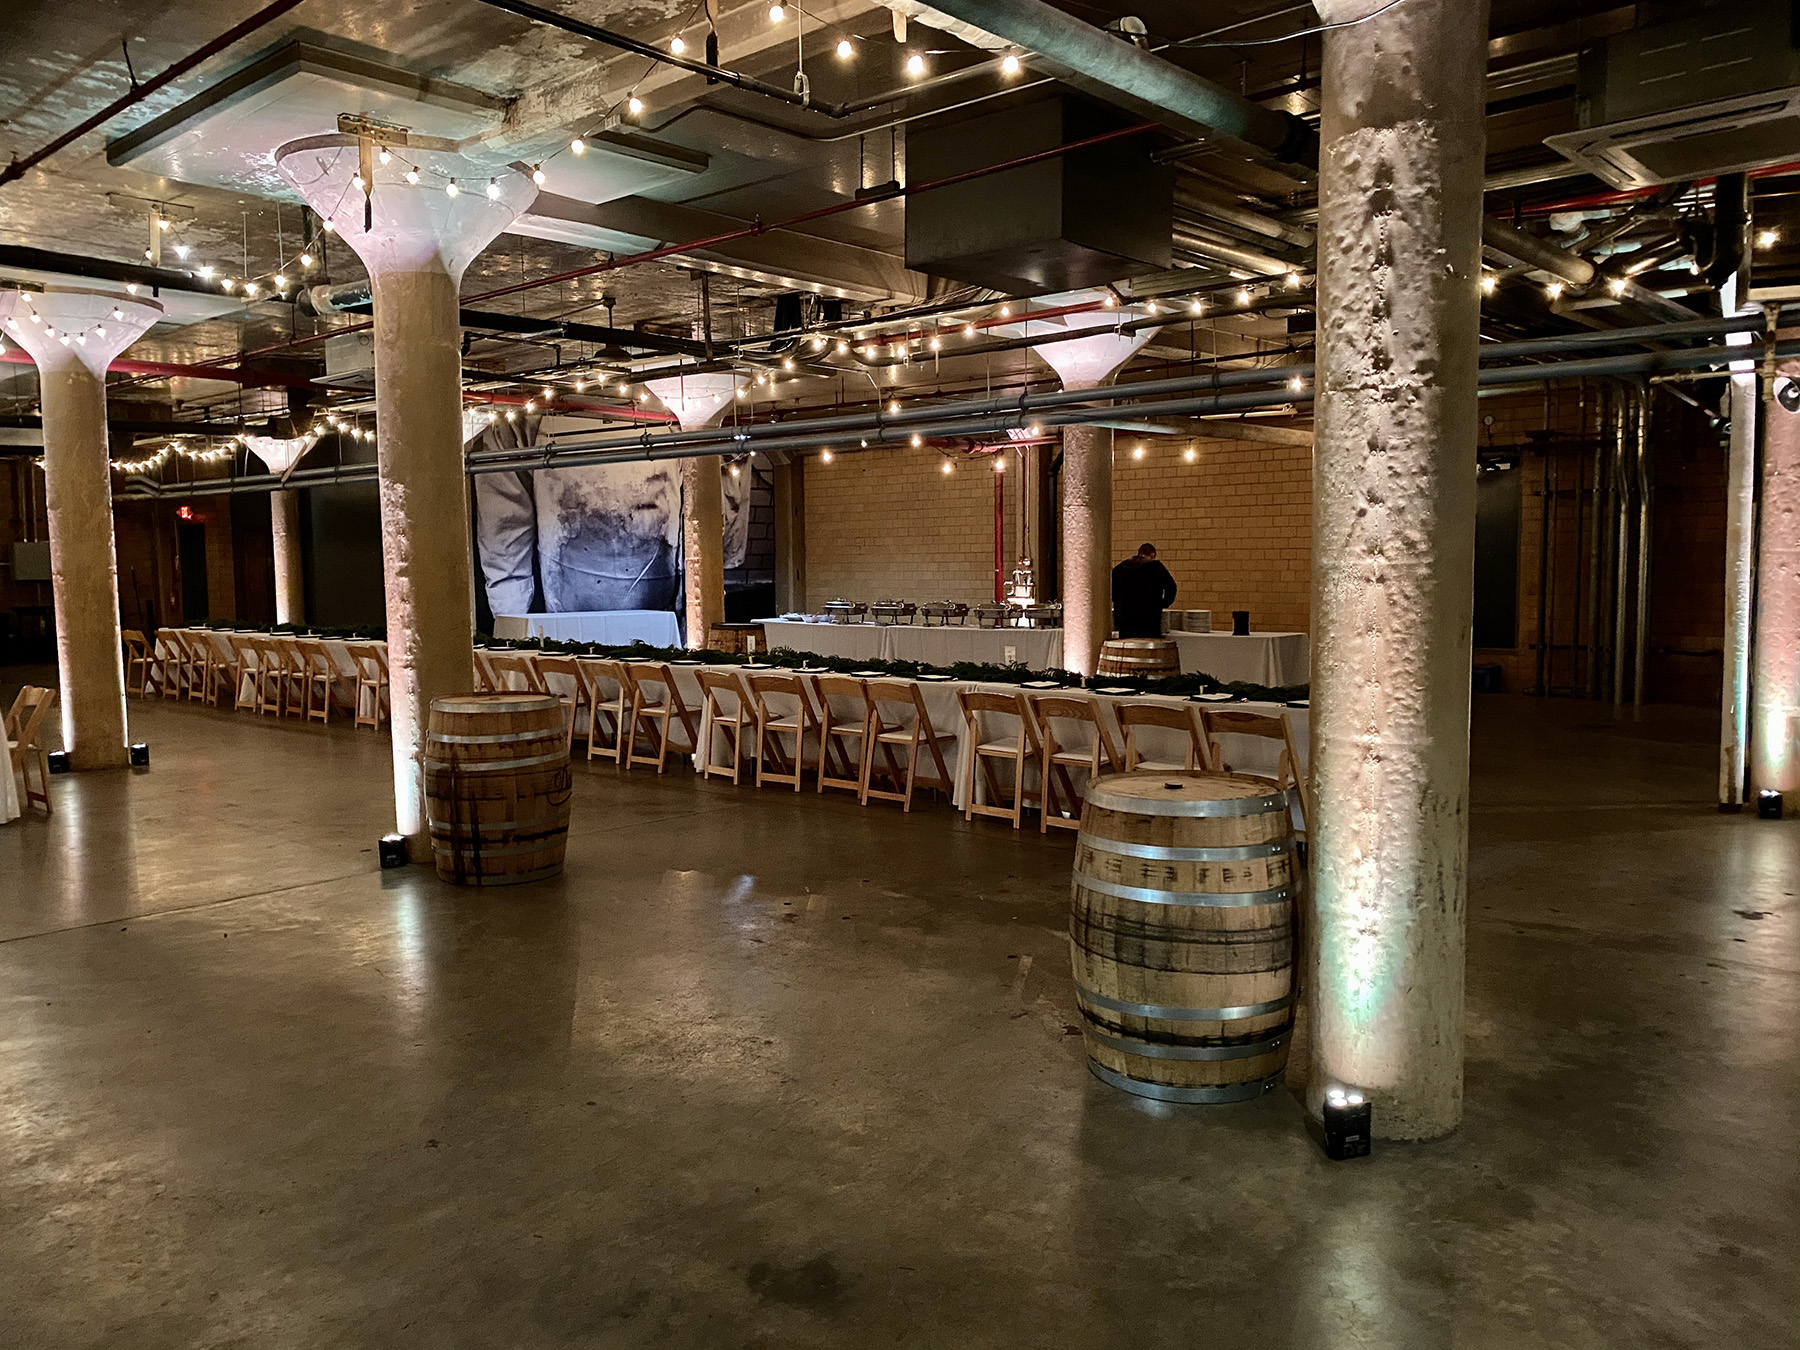 The Whiskey Factory wedding with Detroit wedding uplighting